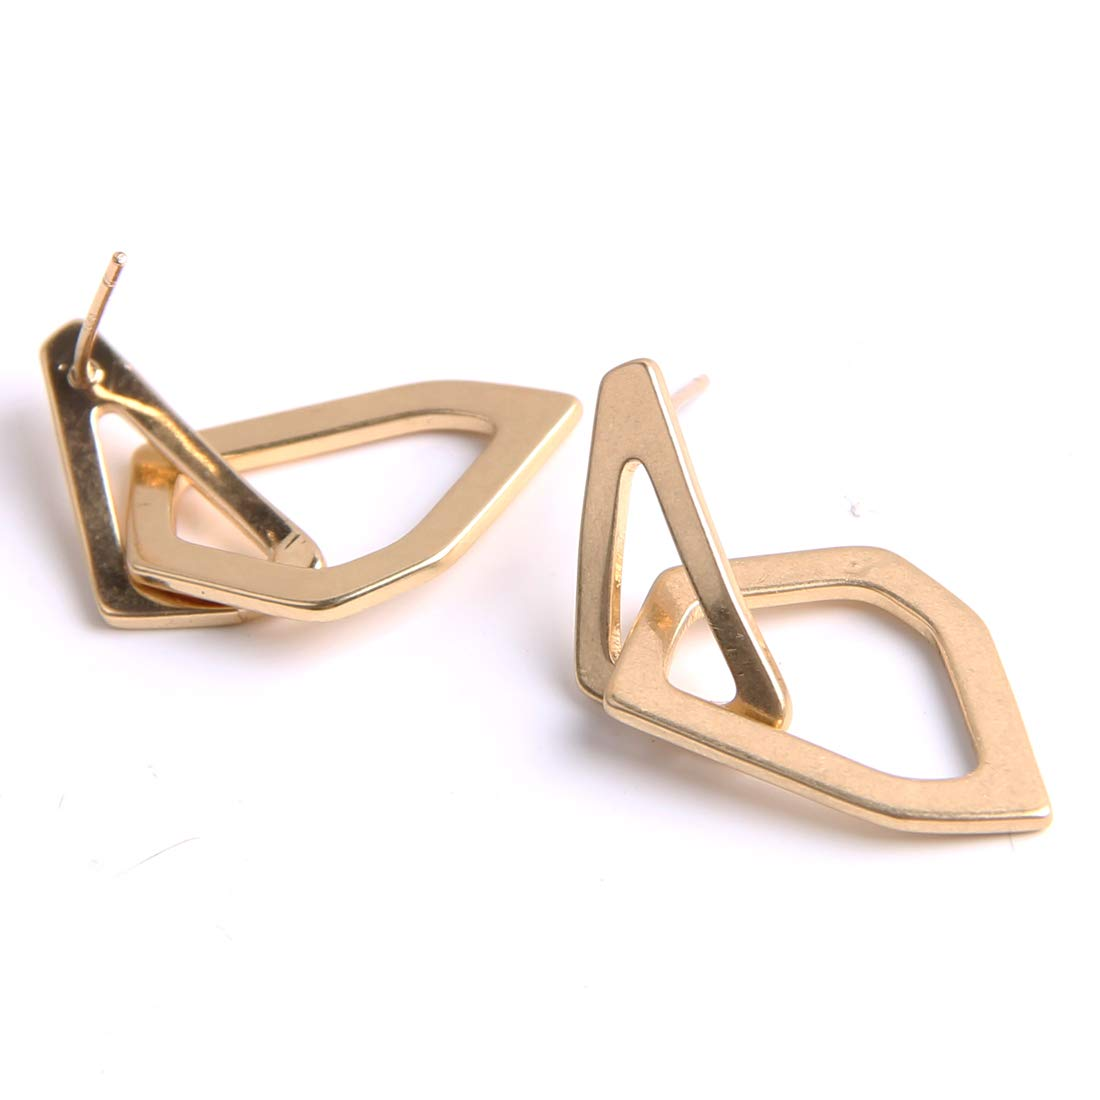 Yeslady Personality Geometry Triangle Dangle Earring Irregularity Gold Plated Drop Earring for Girls Women